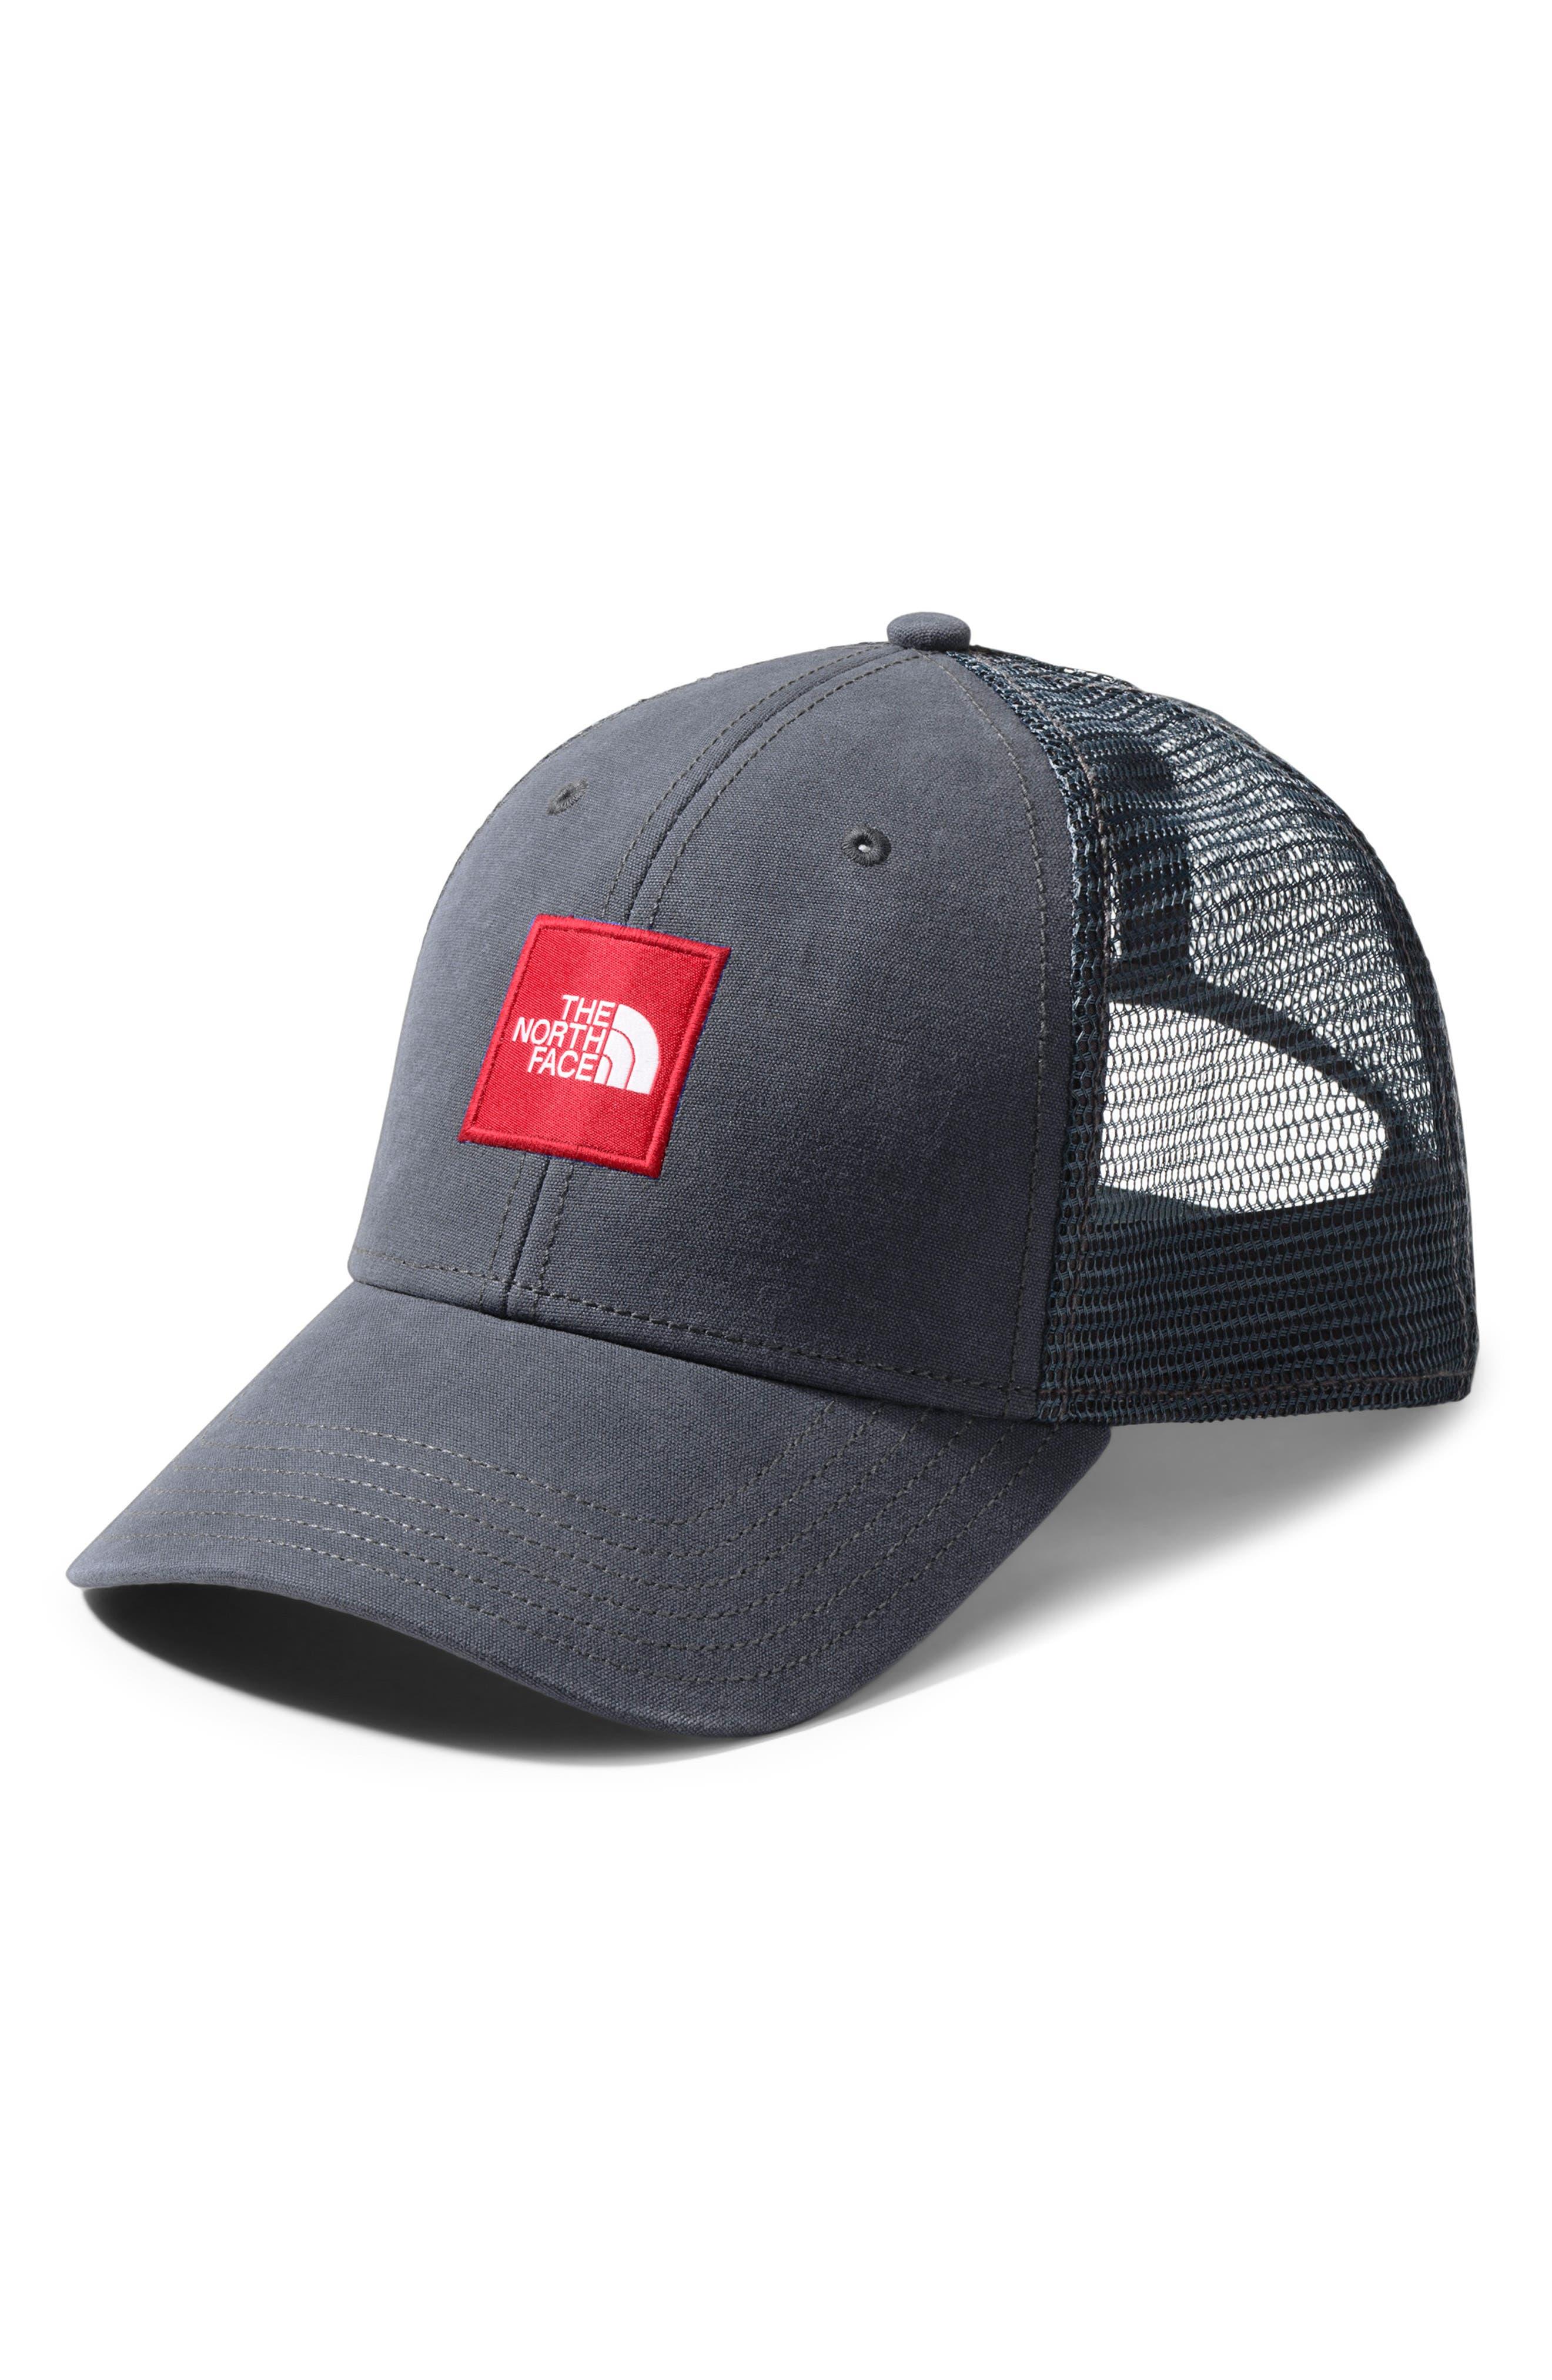 5ed904a7e4d Hats The North Face